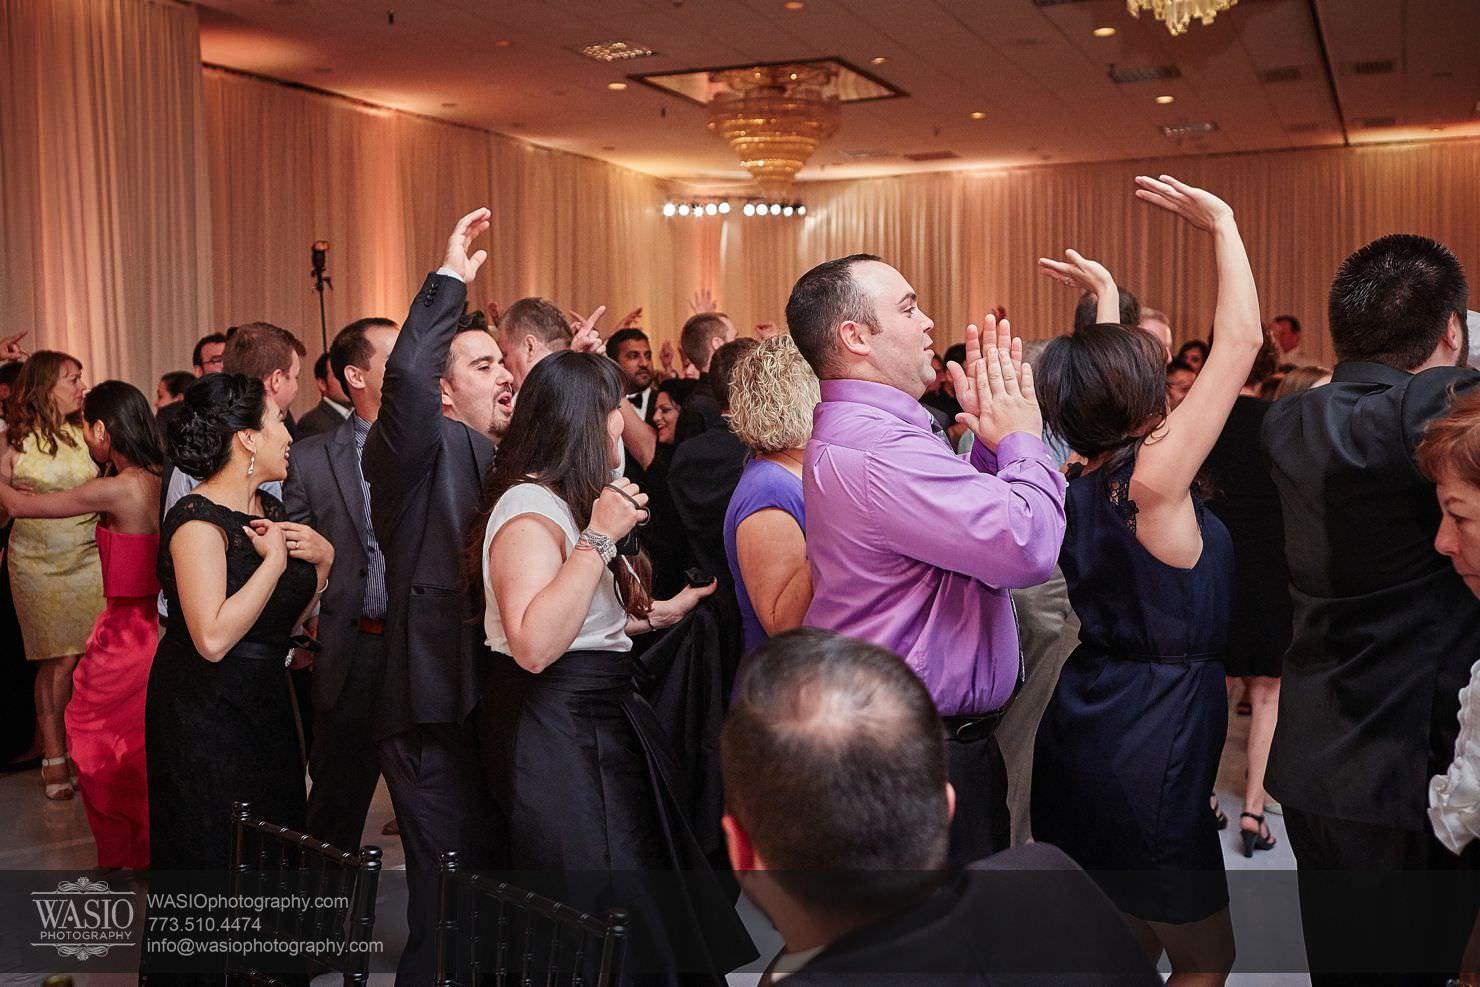 051_Chicago-Spring-Wedding_Chrissy-Andrew_0O3A2469 Chicago Spring Wedding - Chrissy + Andrew